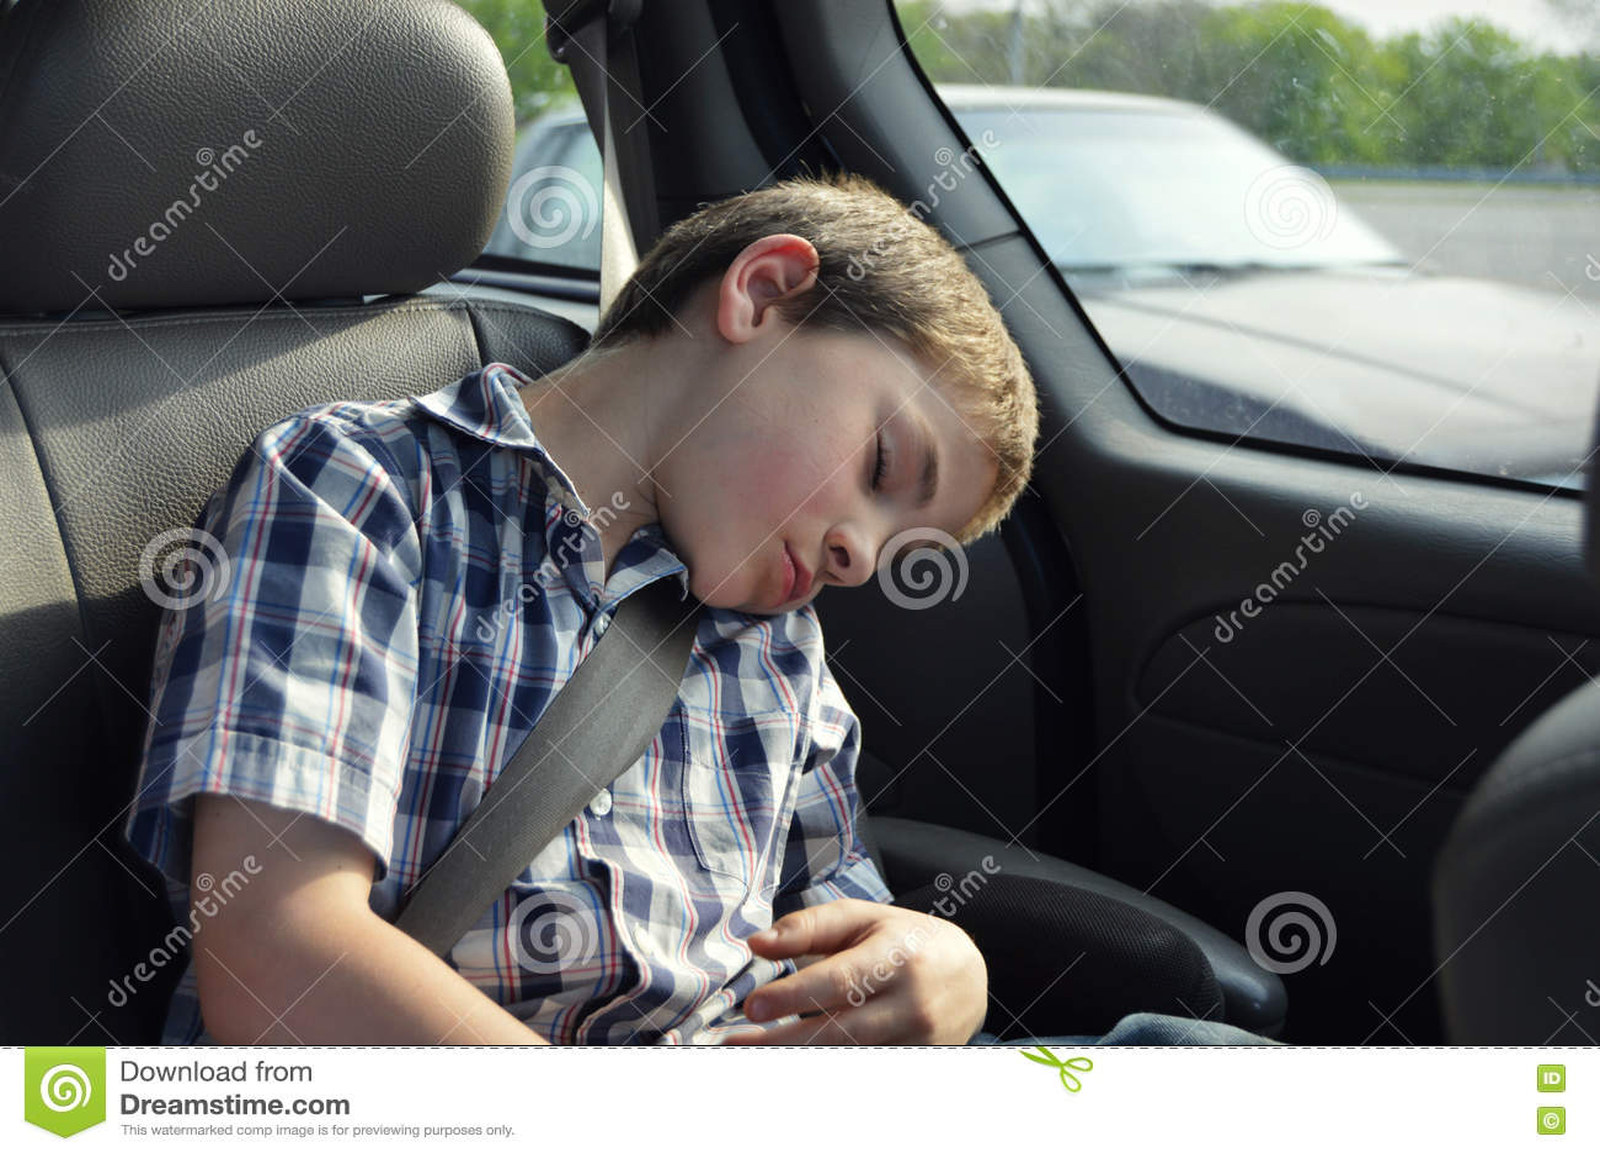 Boy Sleeping In Car Stock Photo Image 71372751